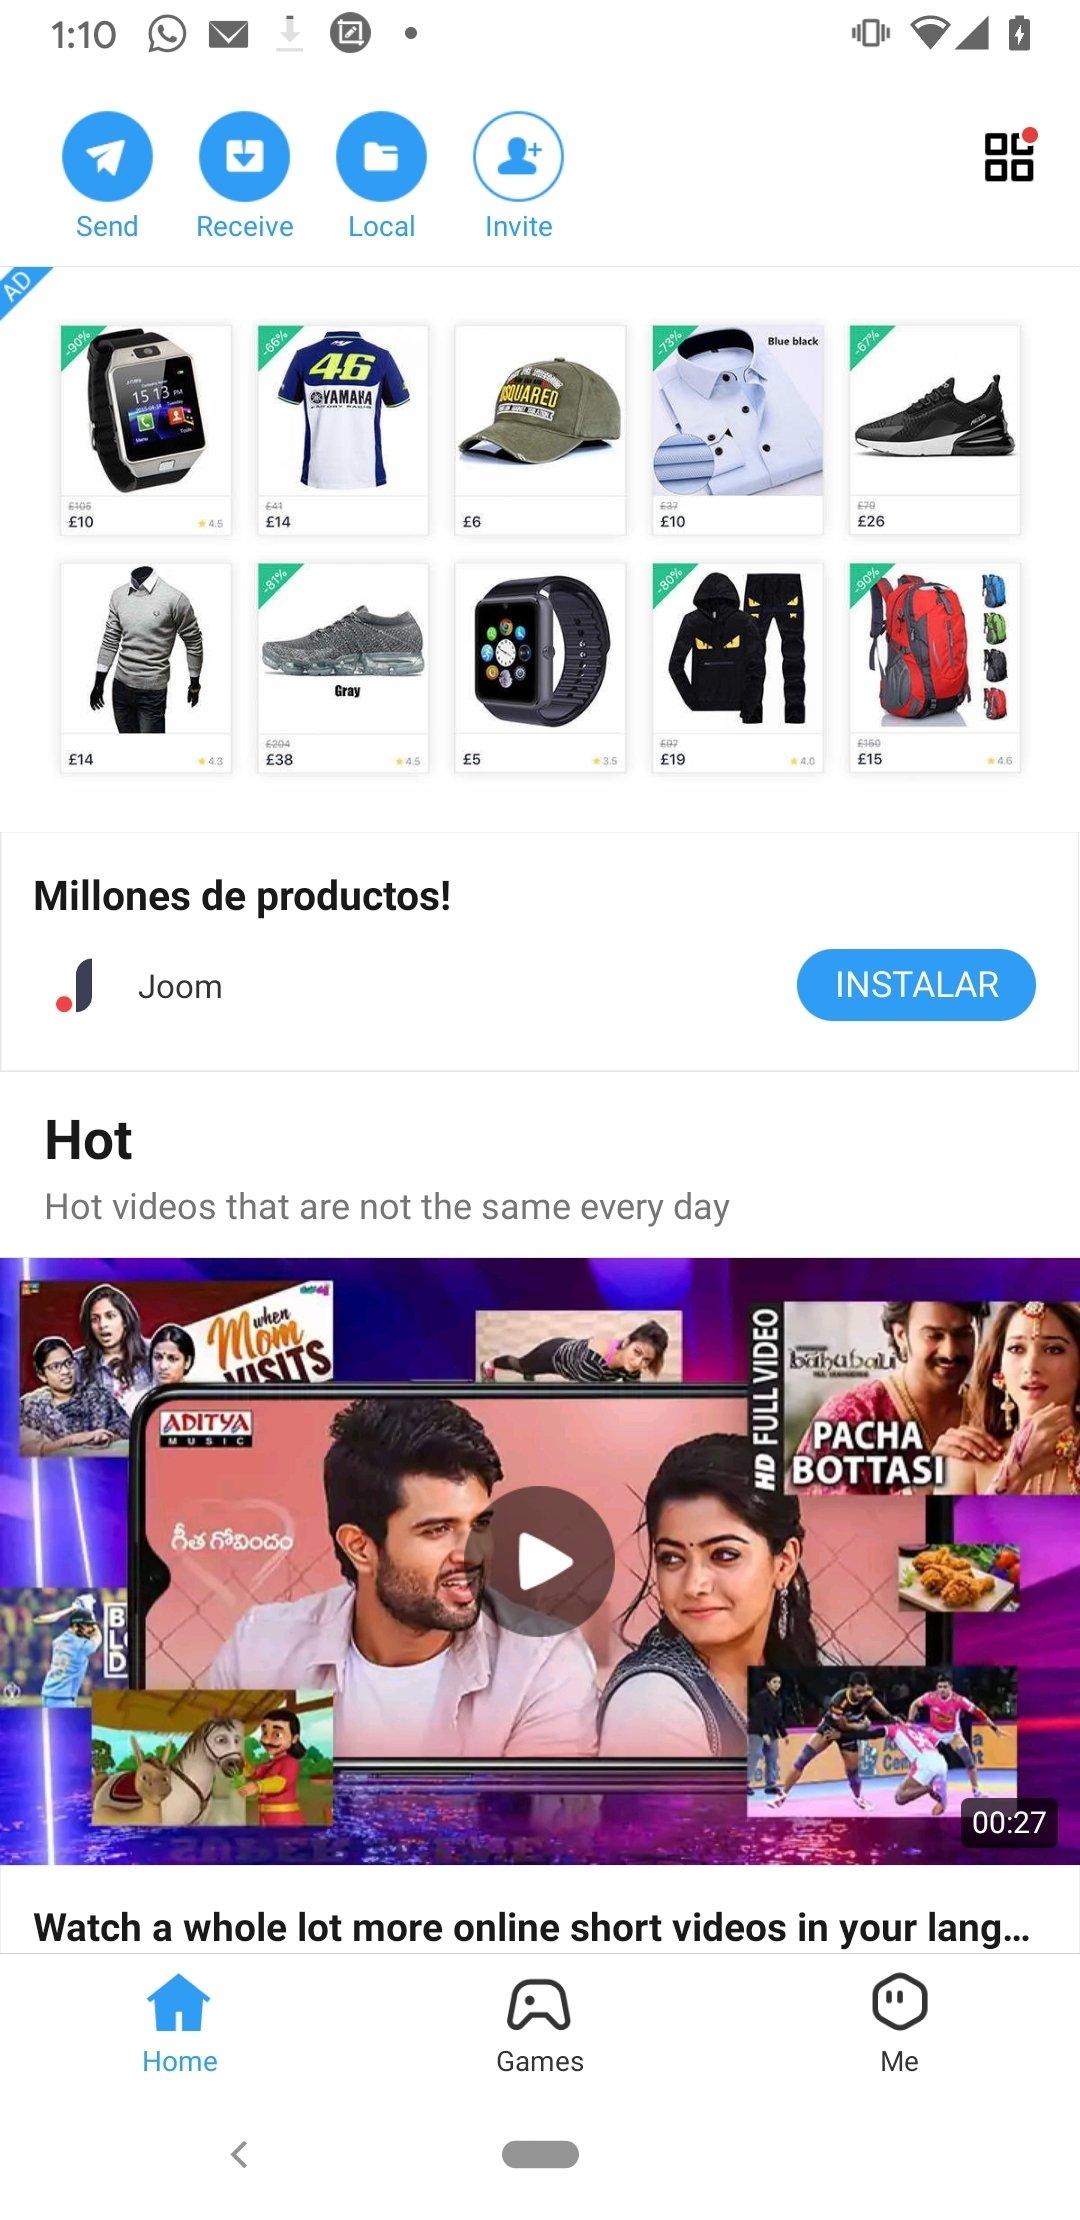 apk file of shareit app